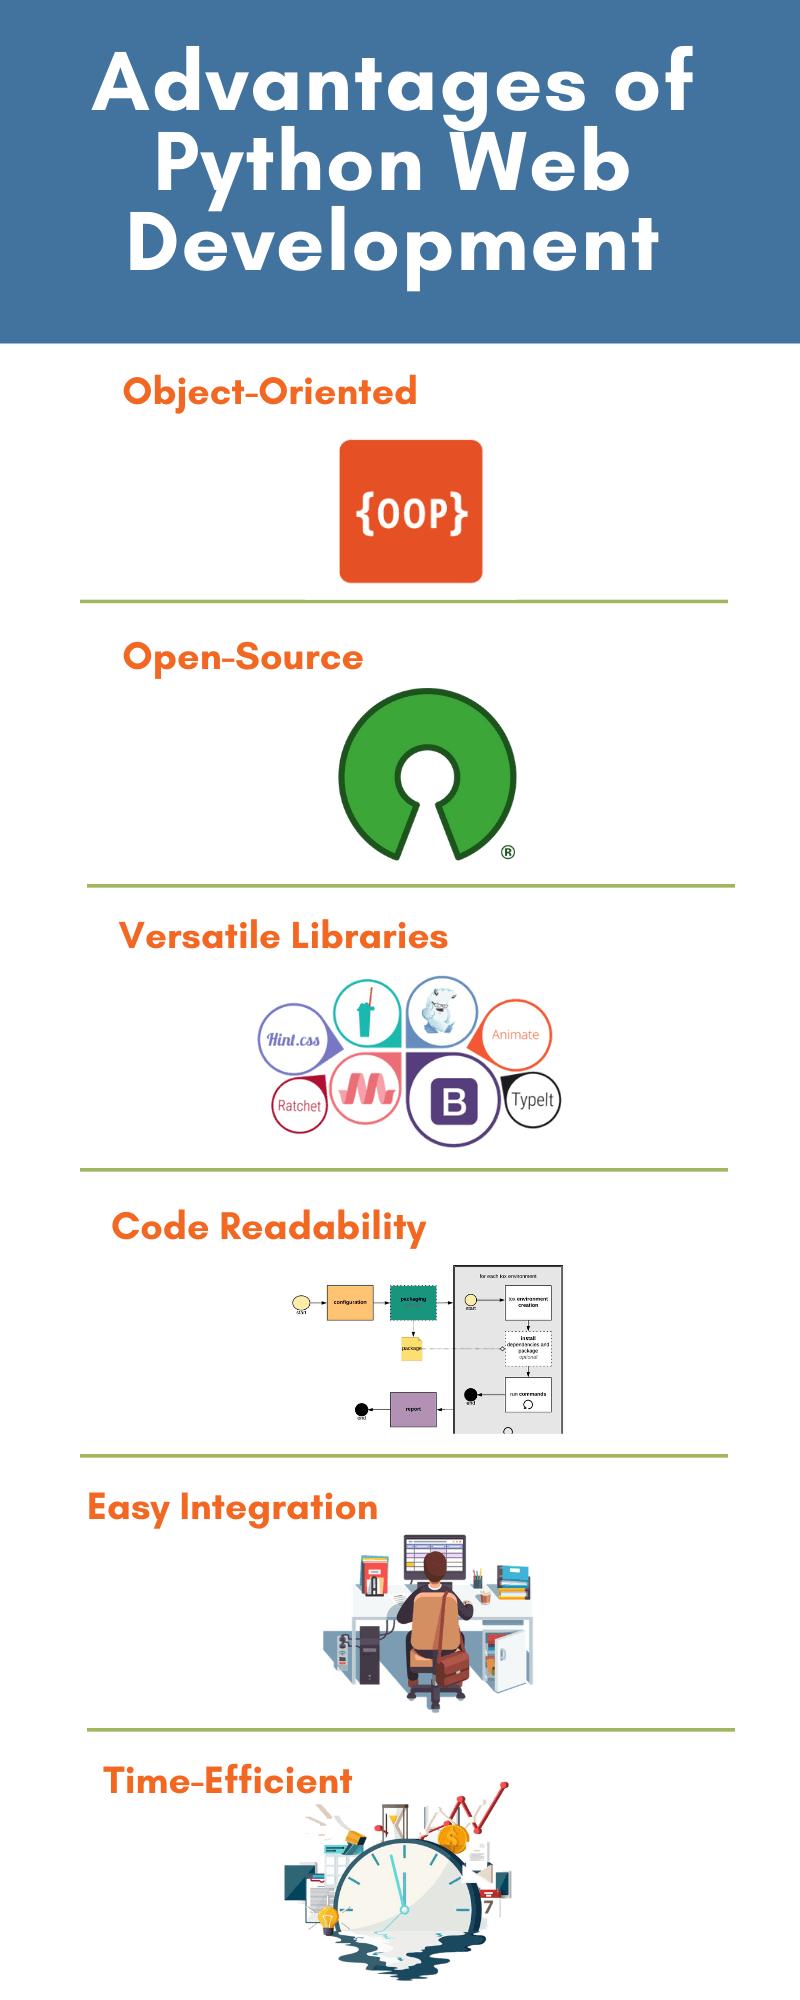 Advantages of Python Web-Development